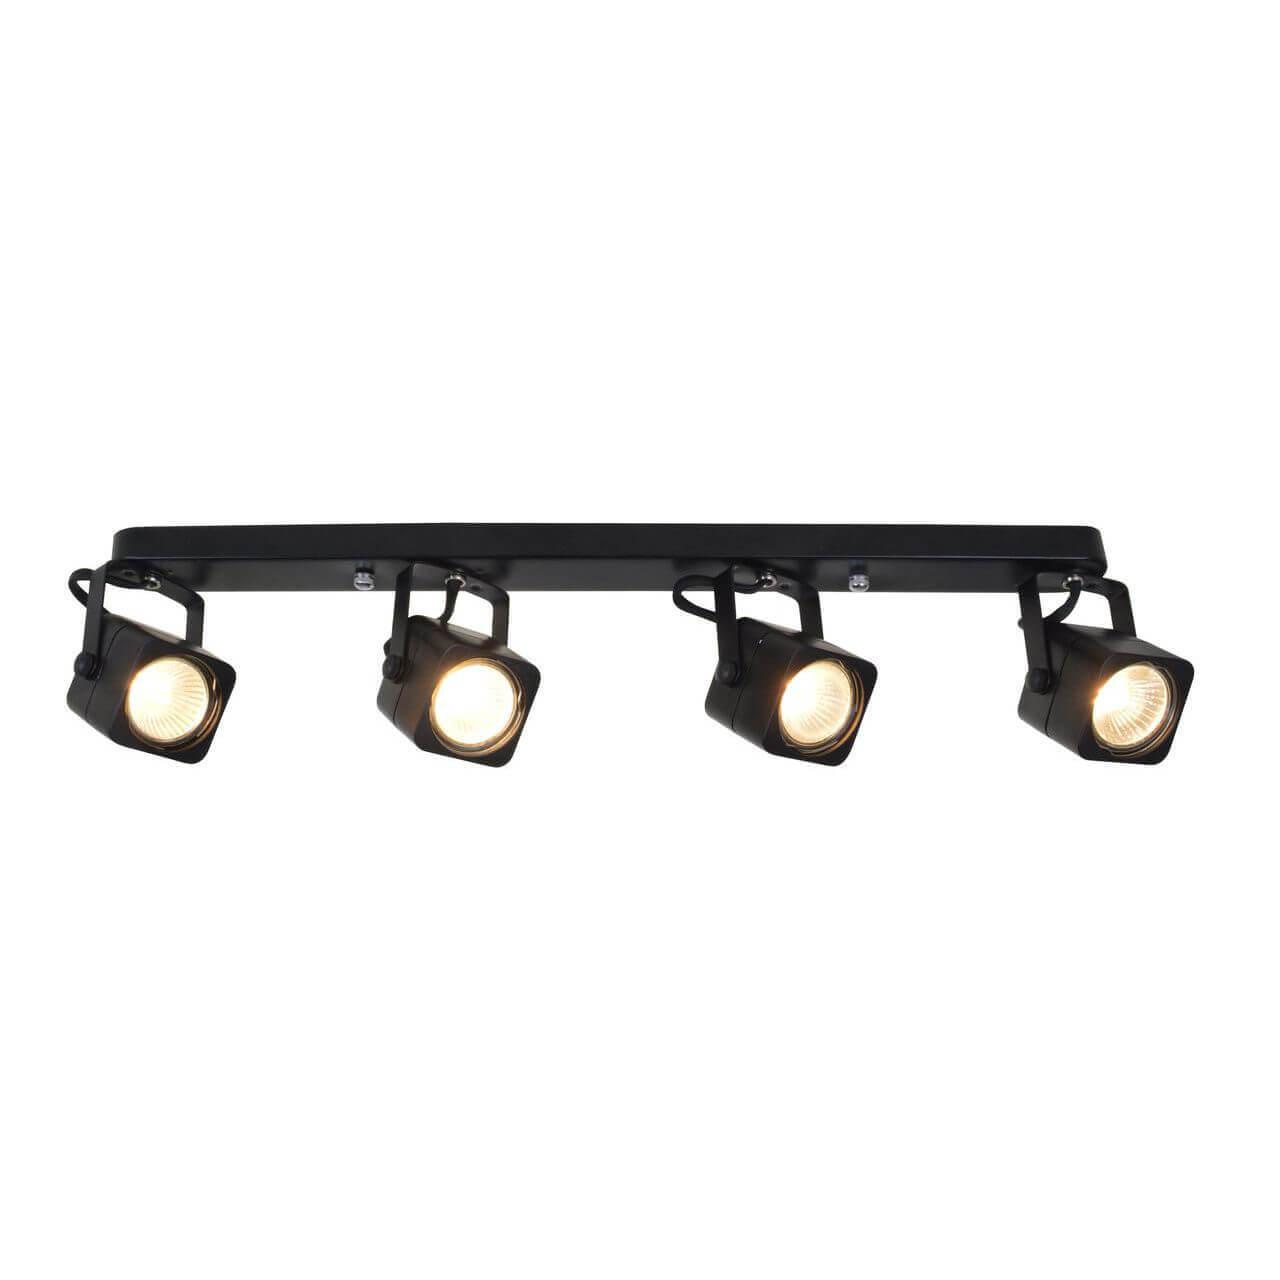 Спот Arte Lamp A1314PL-4BK Lente Black недорого